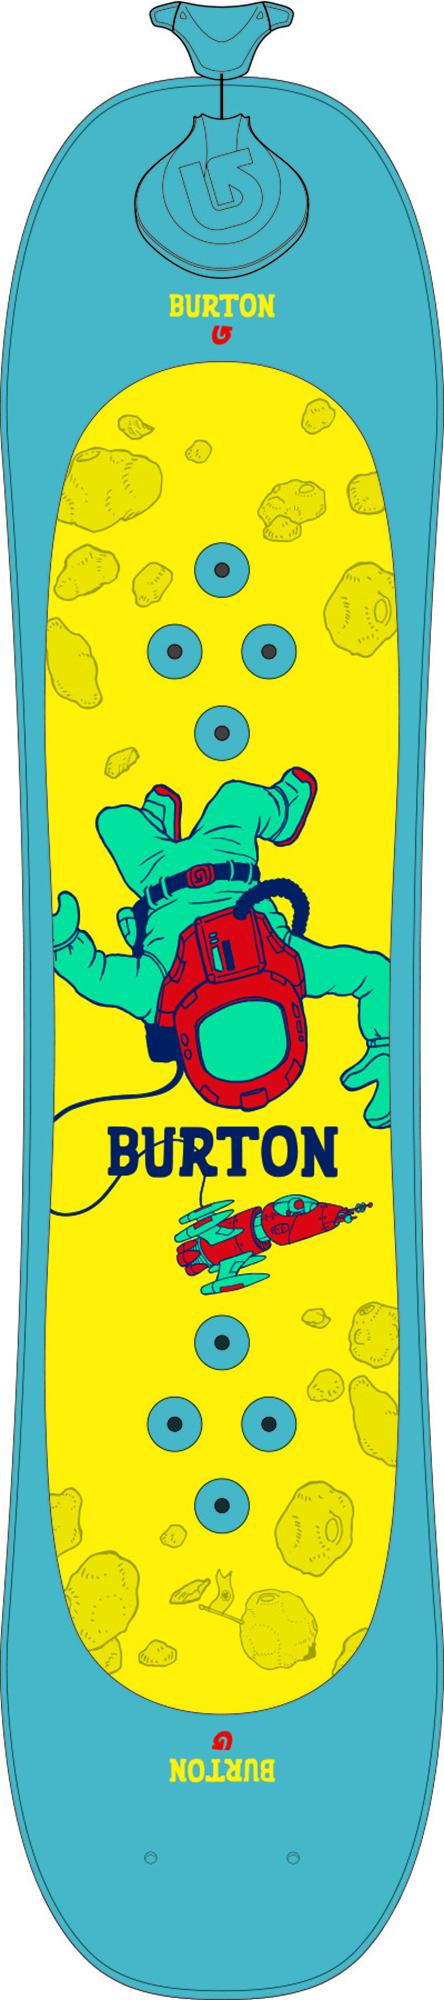 купить Burton Burton Riglet Board (18/19) недорого